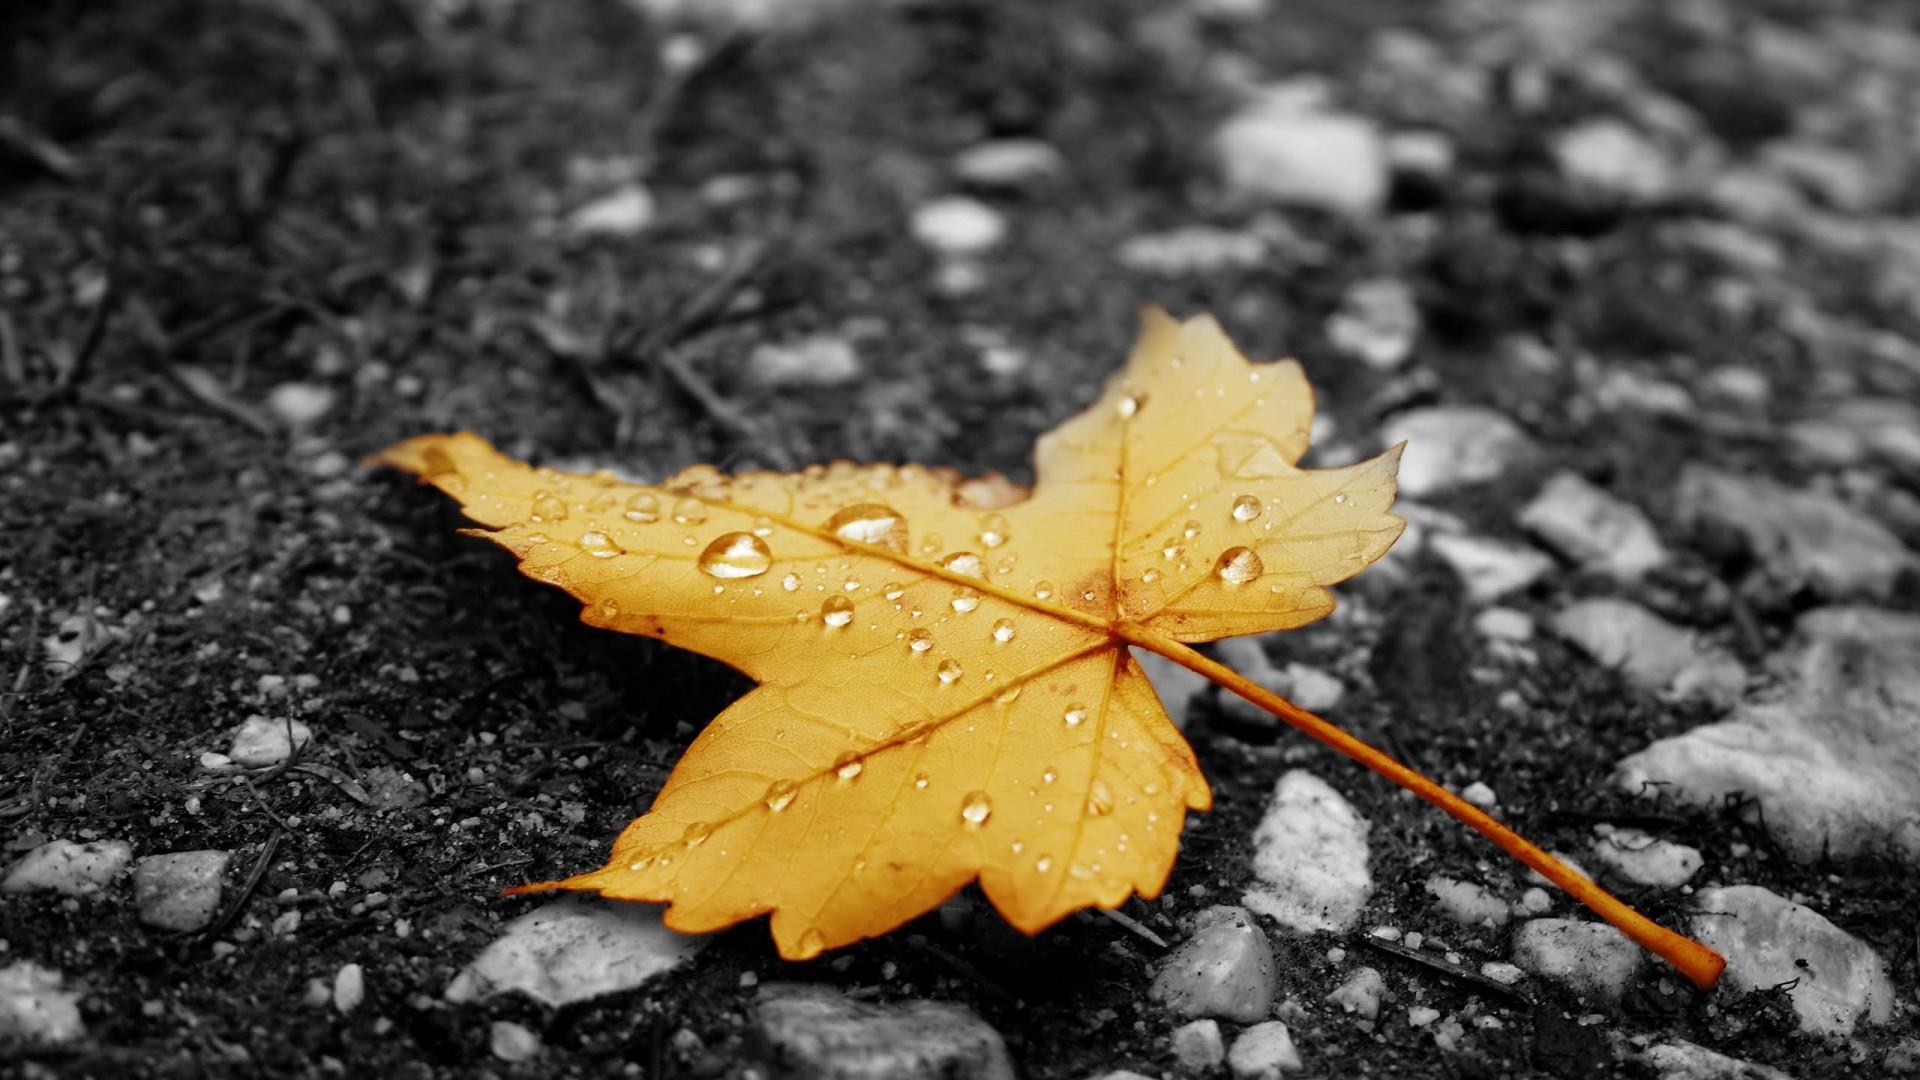 raindrops-on-a-leaf-wallpaper-3.jpg